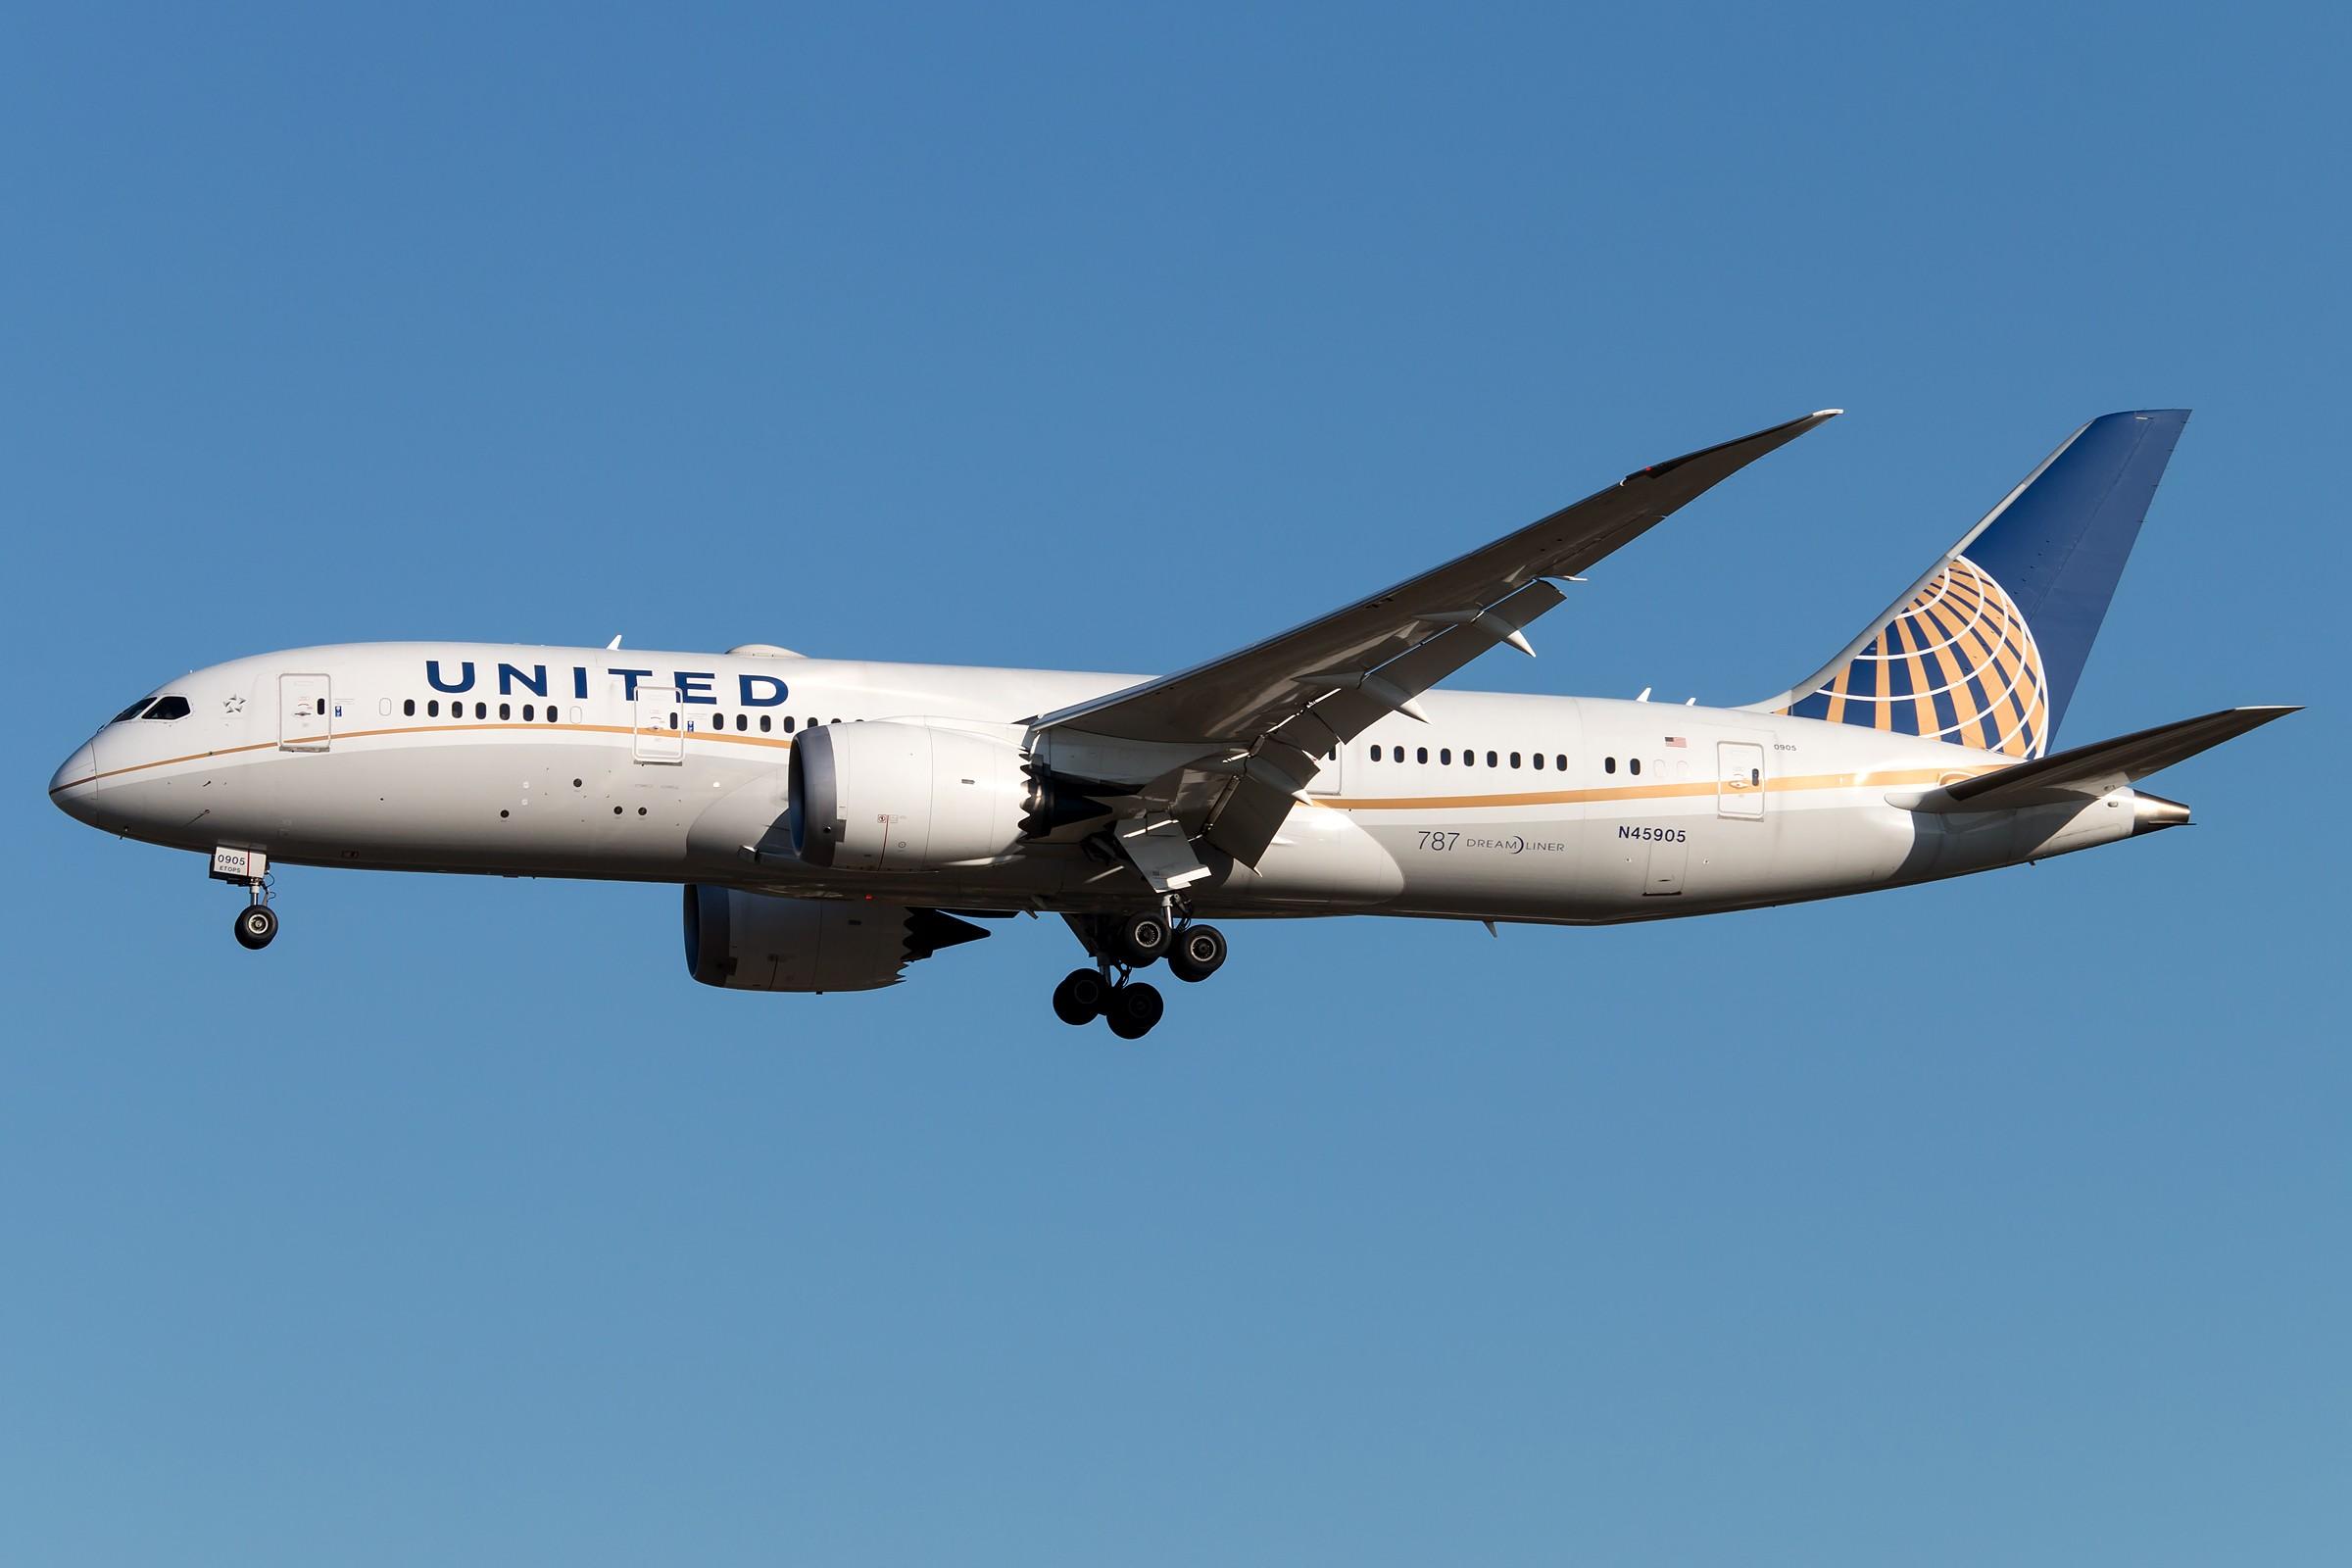 Re:[原创]杂图5张 BOEING 787-8 DREAMLINER N45905 中国北京首都国际机场